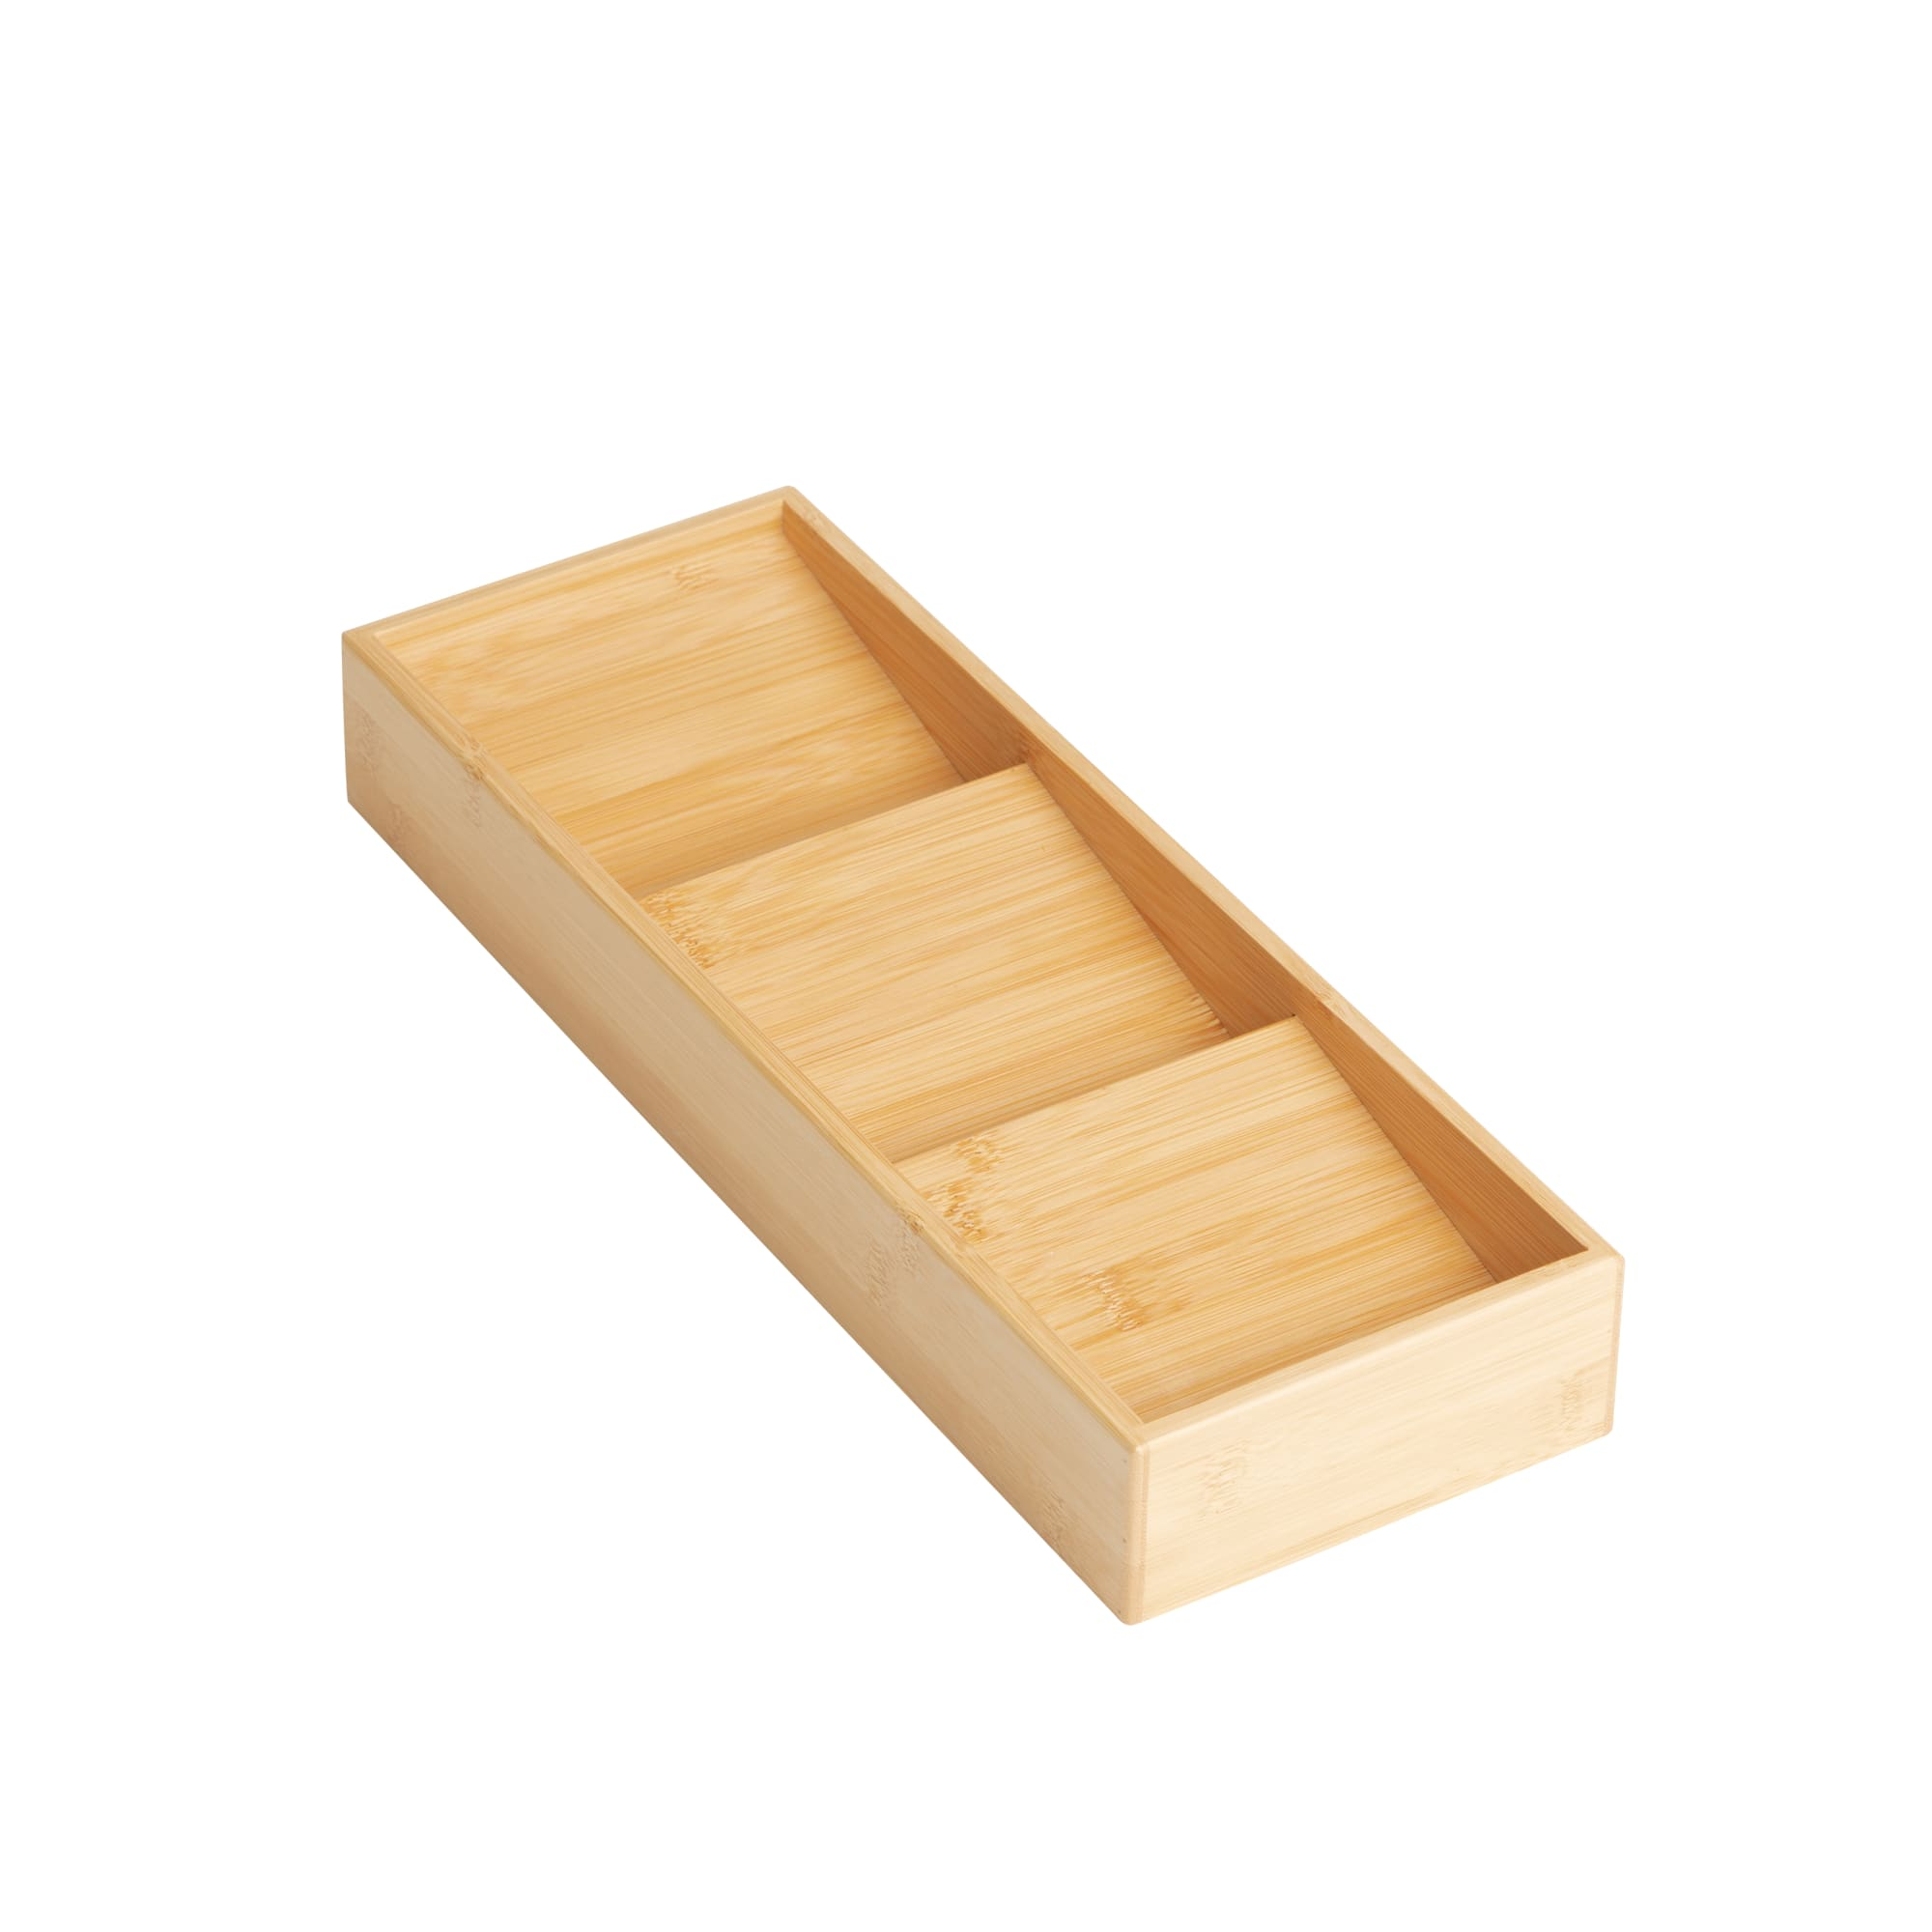 Kitchen Pro Eco Spice Drawer Organiser 39x14x5.5cm Natural